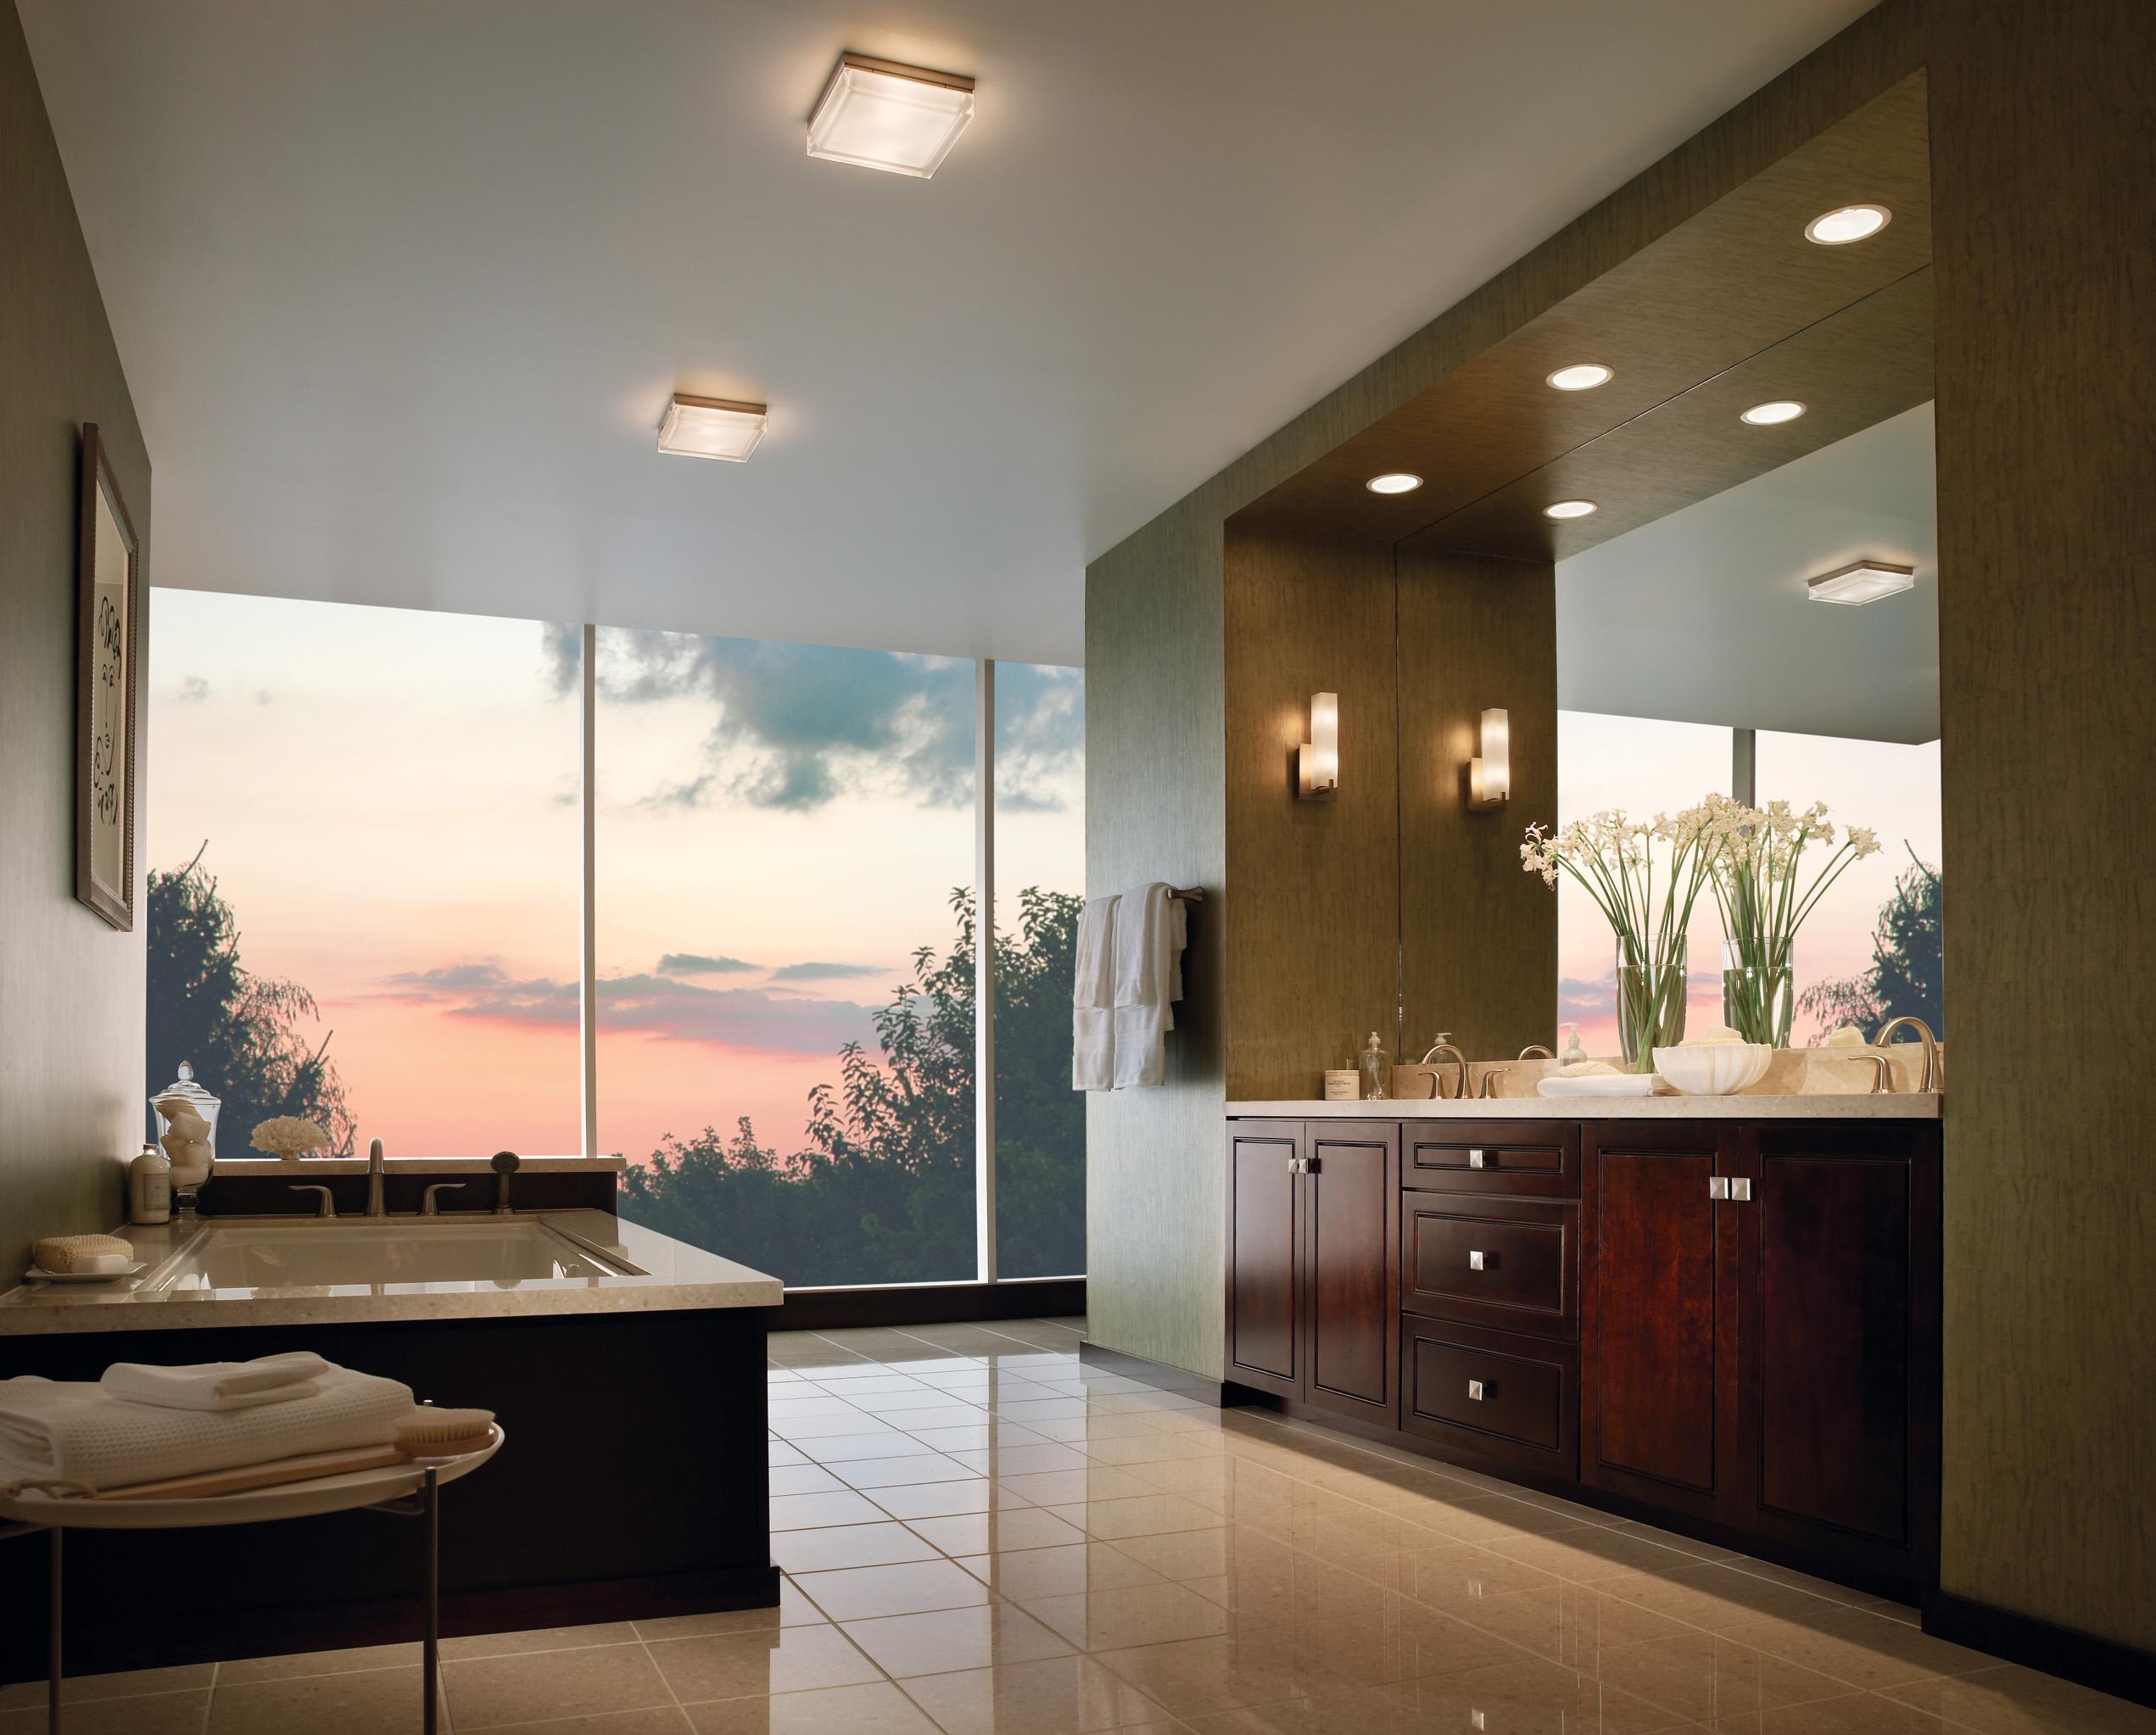 vanity lights ideas black light mirrors bathroom lighting black vanity light fixtures ideas